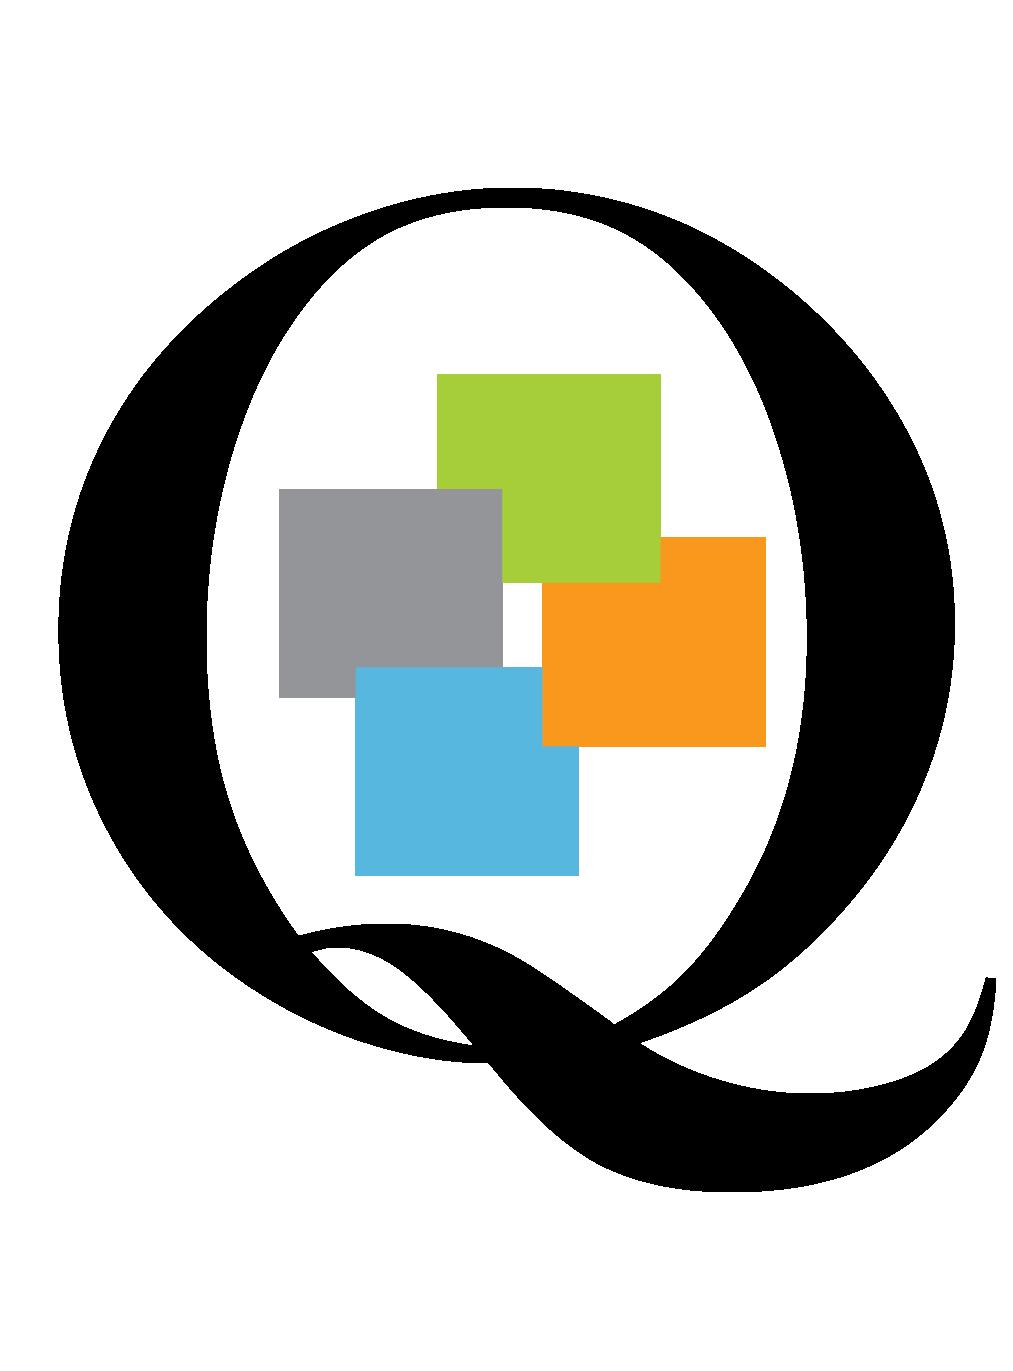 qt-logo-only-transparent